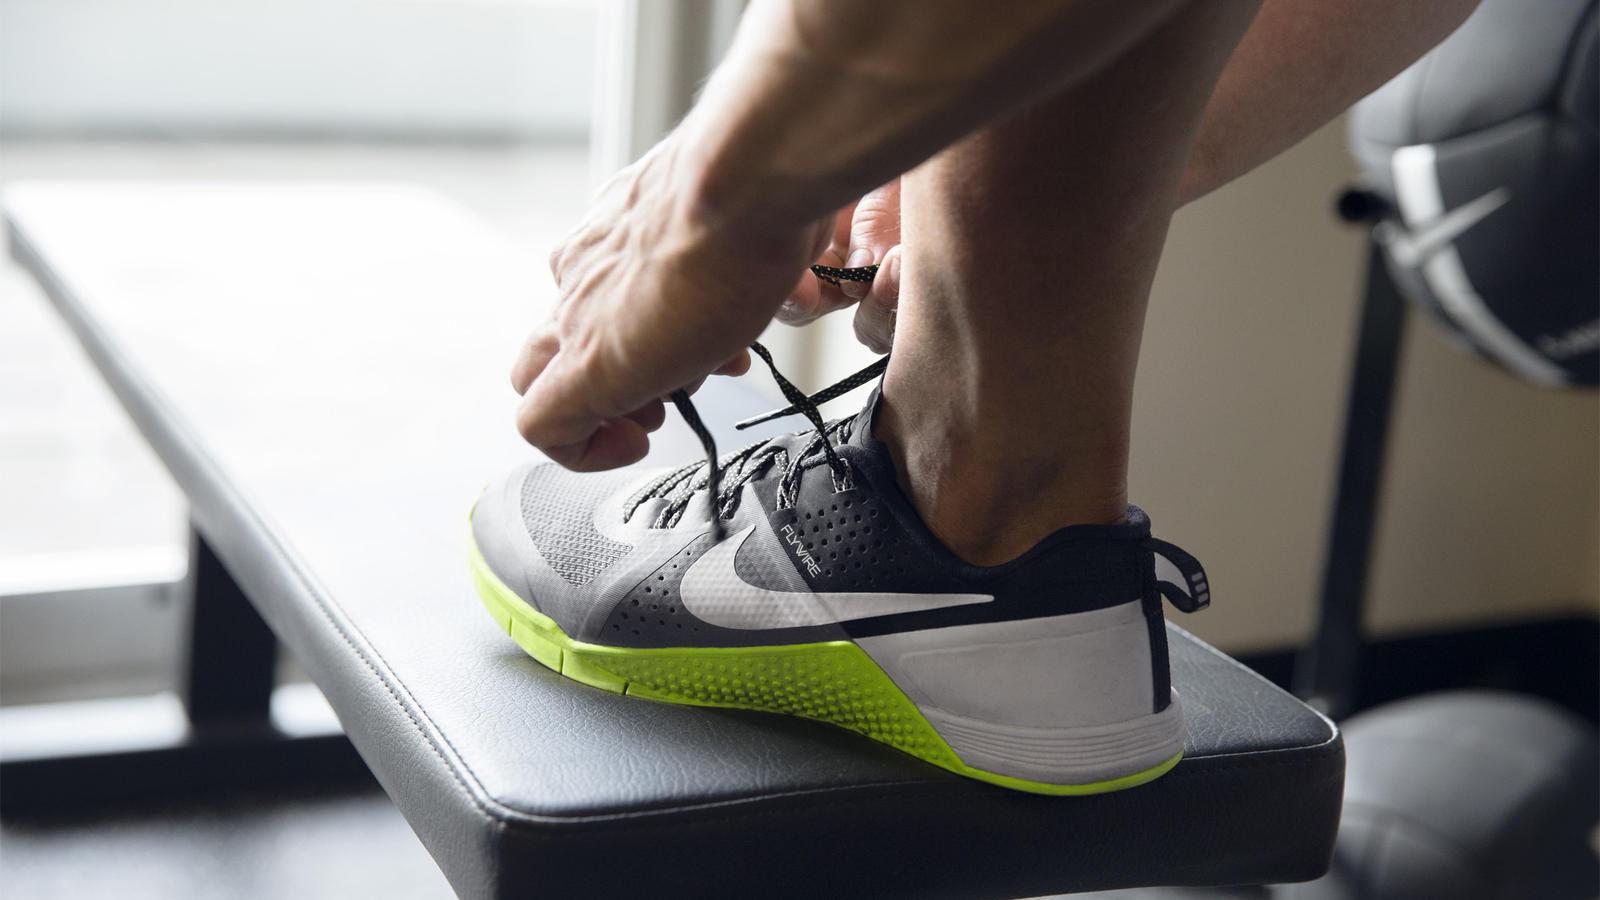 15002_Nike_GC_Inside_Access_Bridges_0402_V1